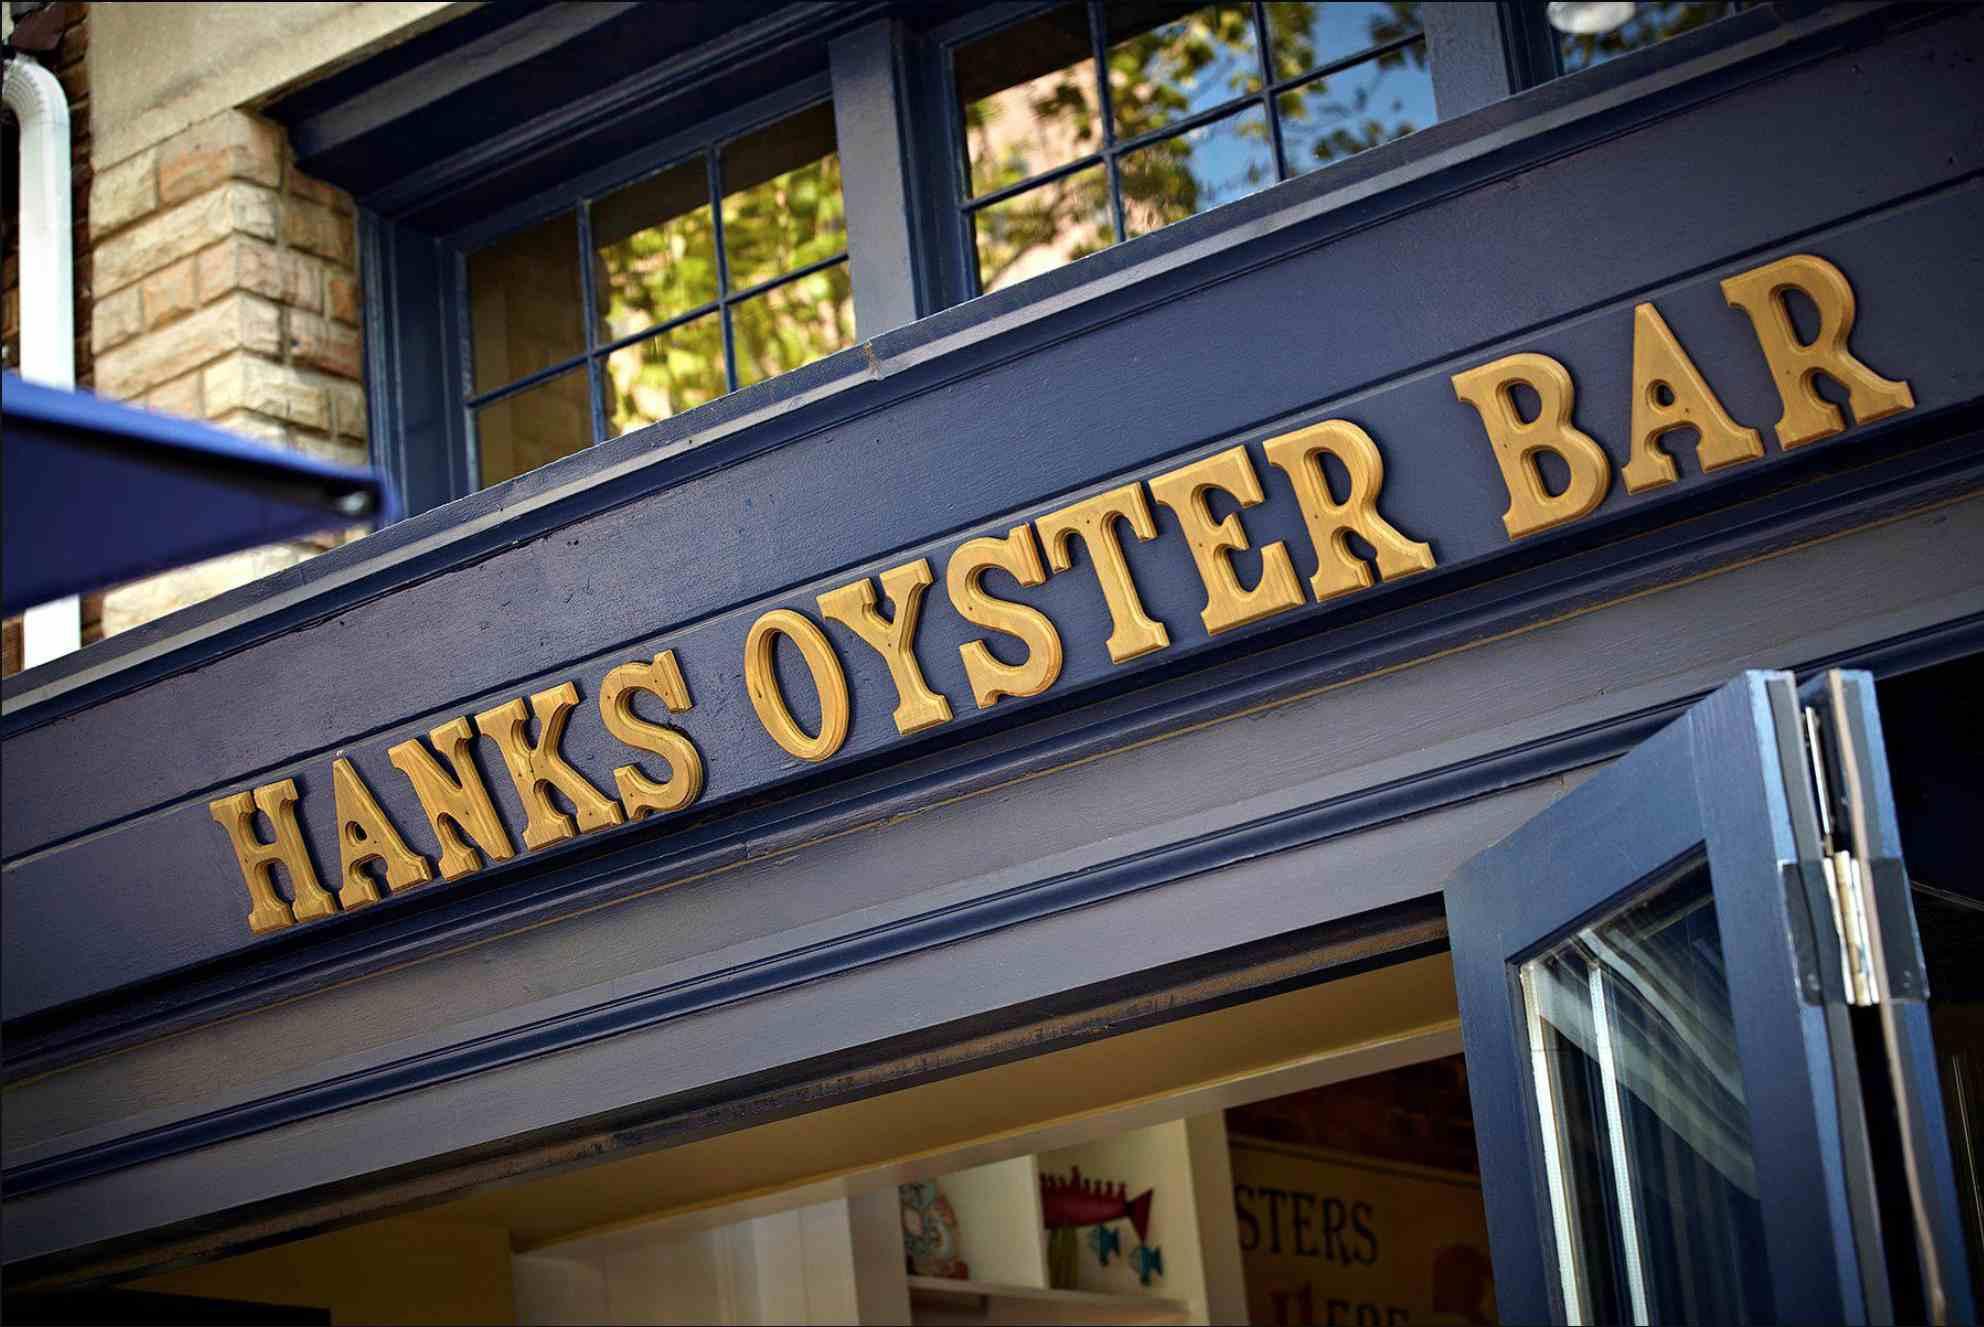 Hank's Oyster Bar sign